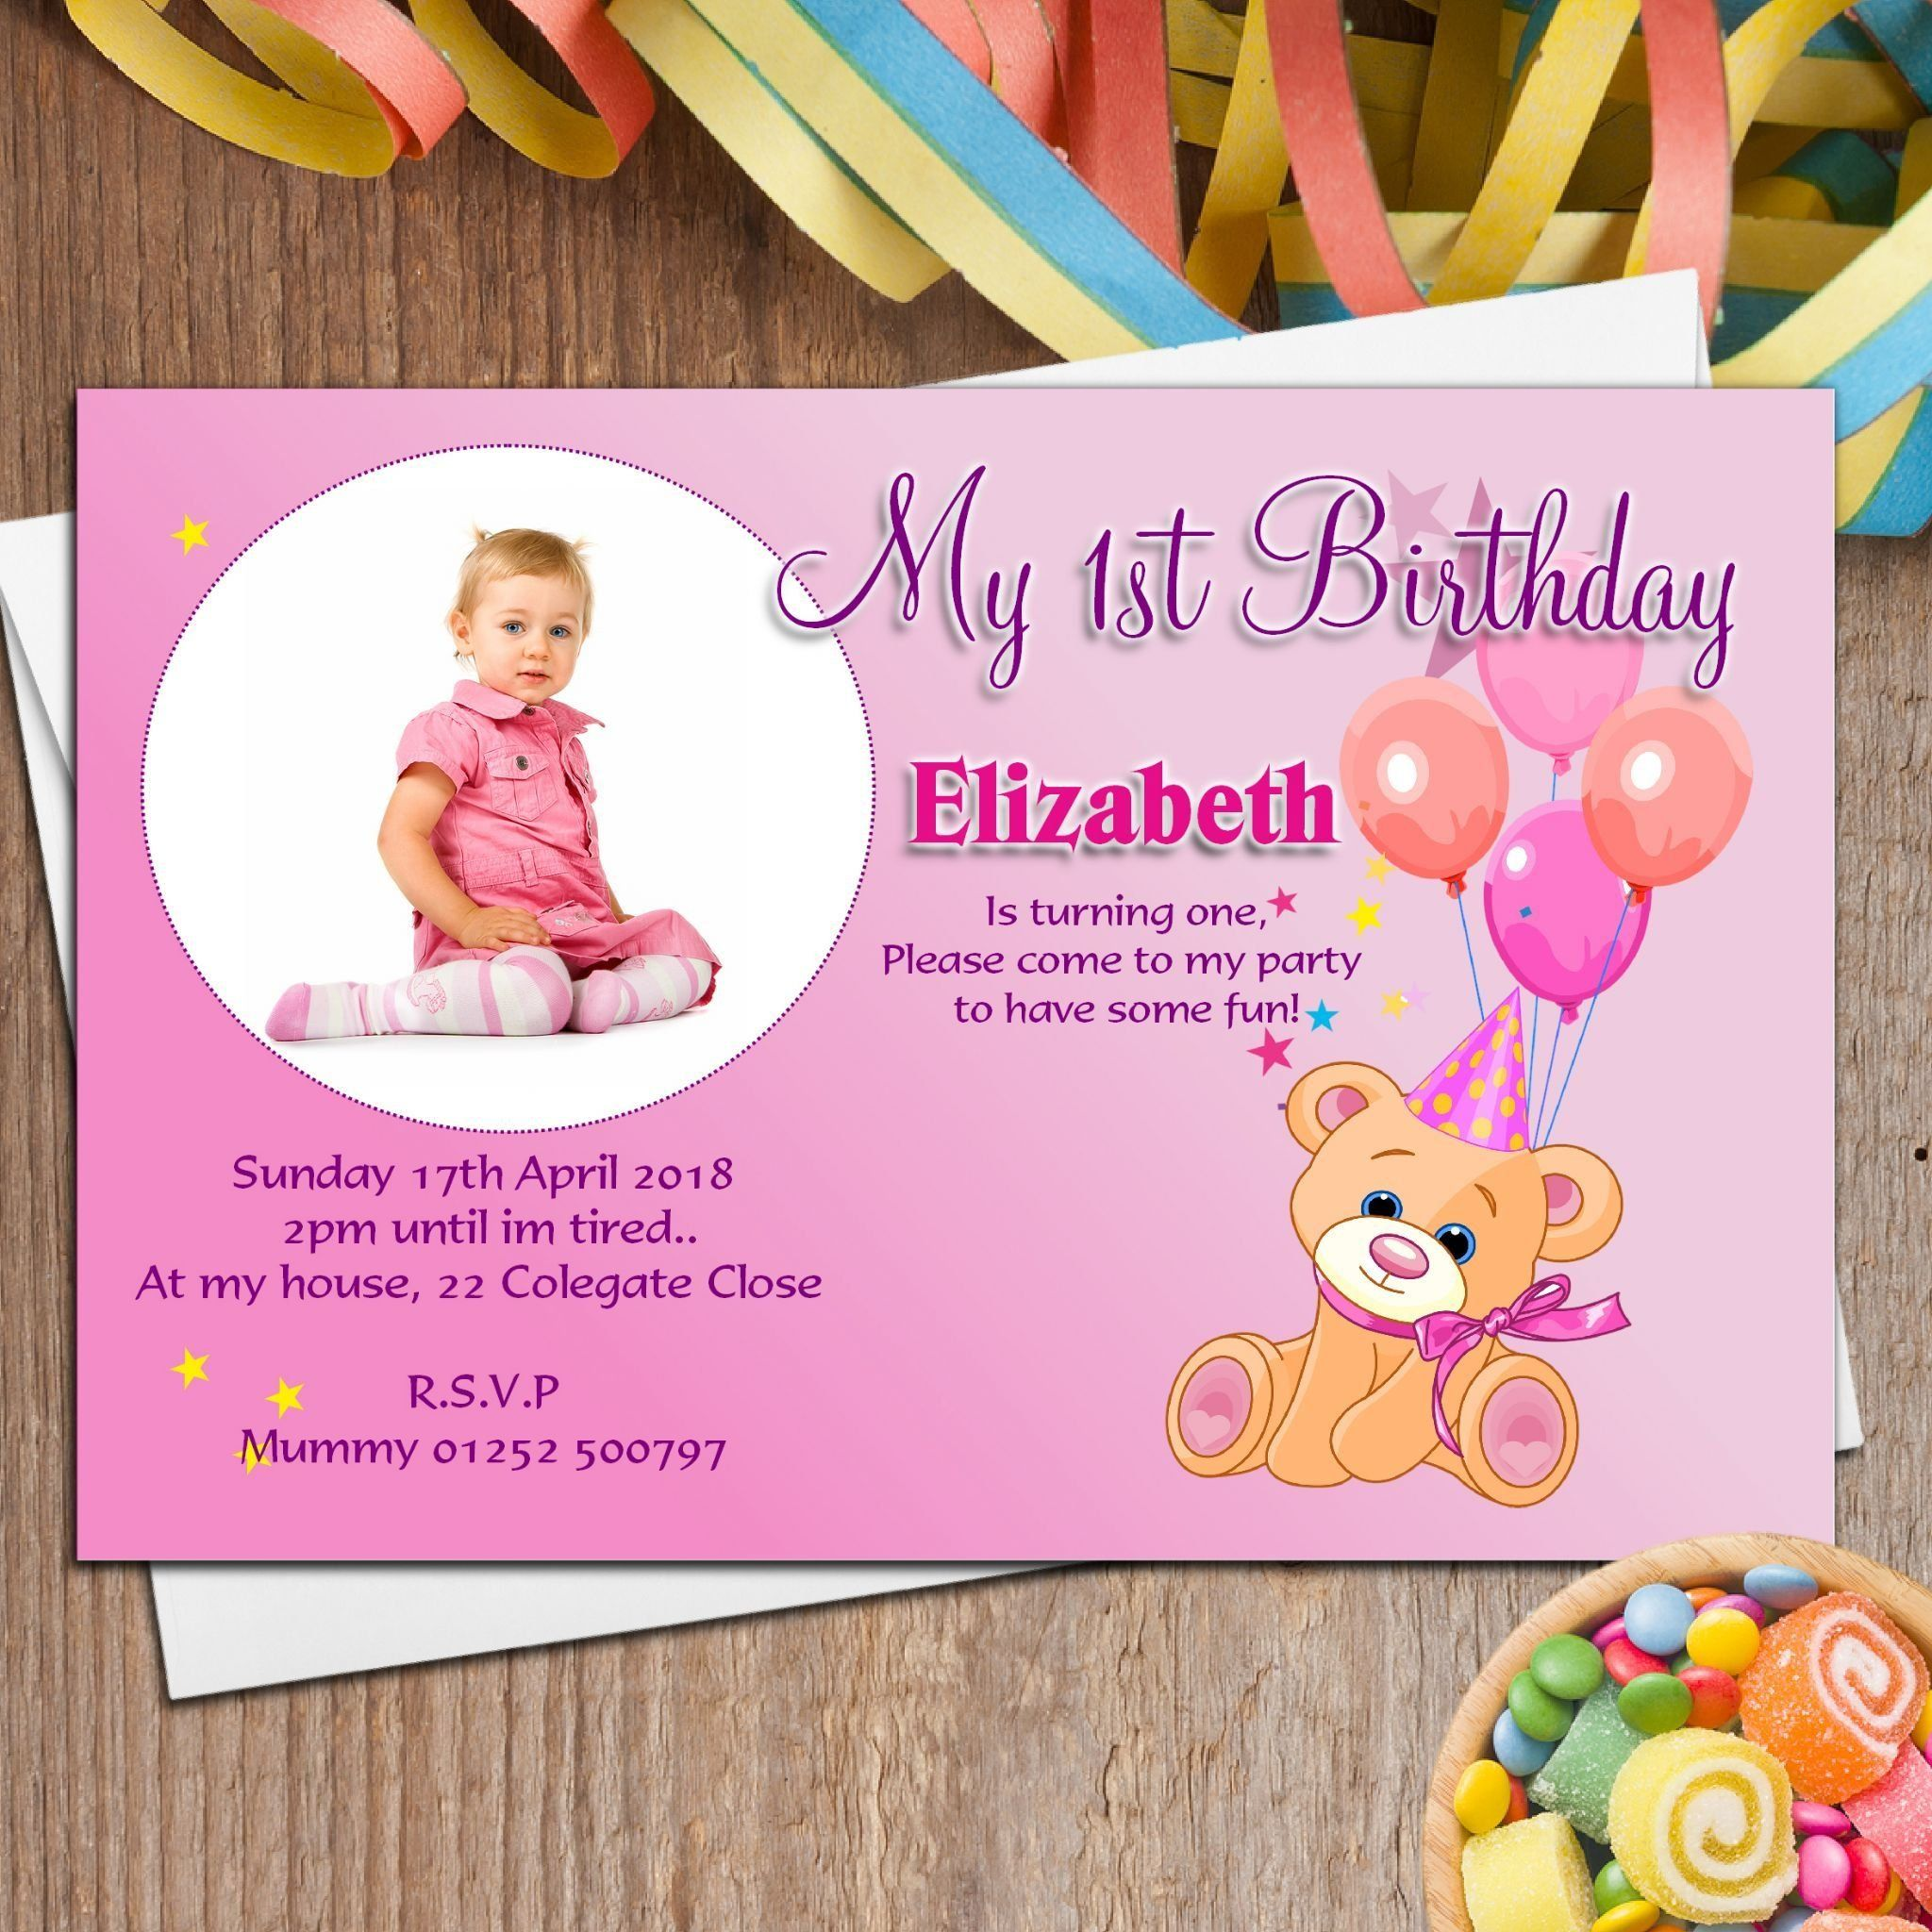 Birthday Invitation Message 1 Year Old Ideas 2019 Make Wedding Invita Create Birthday Invitations Birthday Invitation Card Template Baby Birthday Invitations